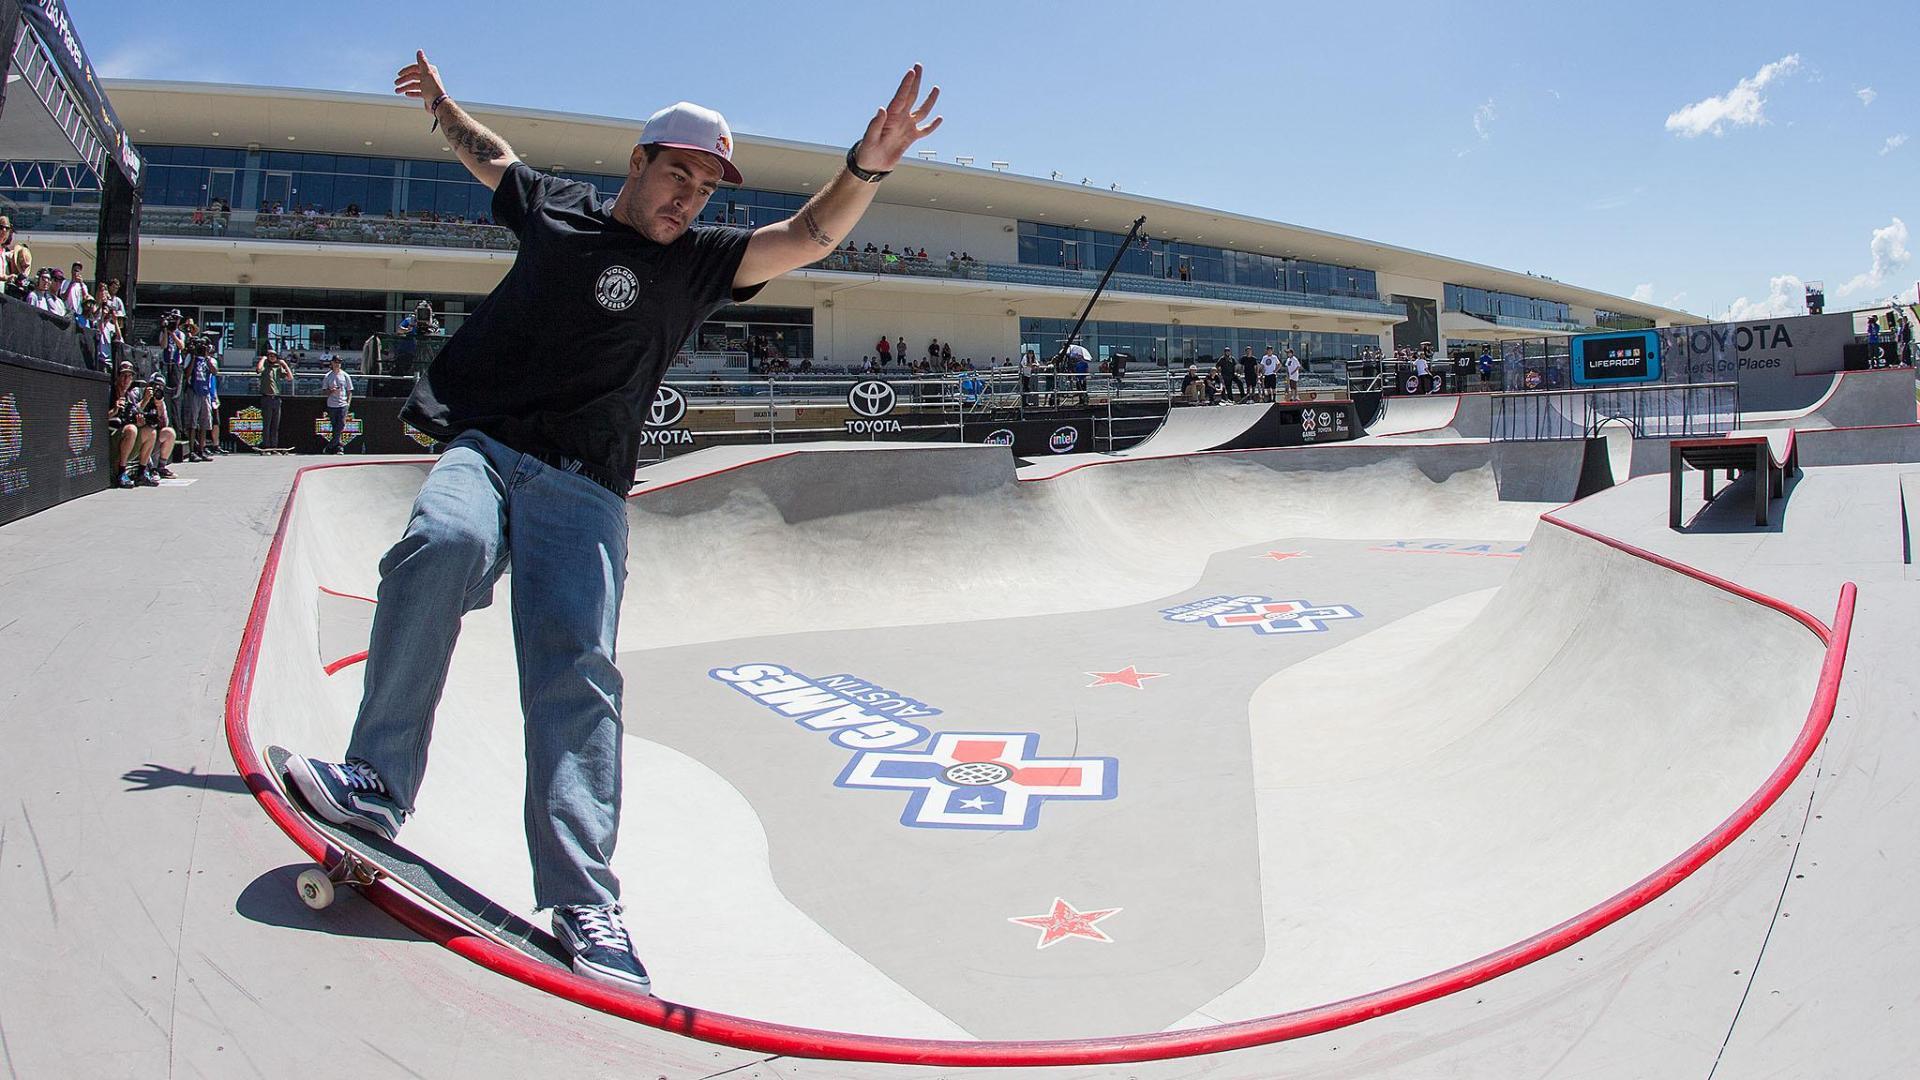 Pedro Barros Wins X Games Skateboard Park Gold